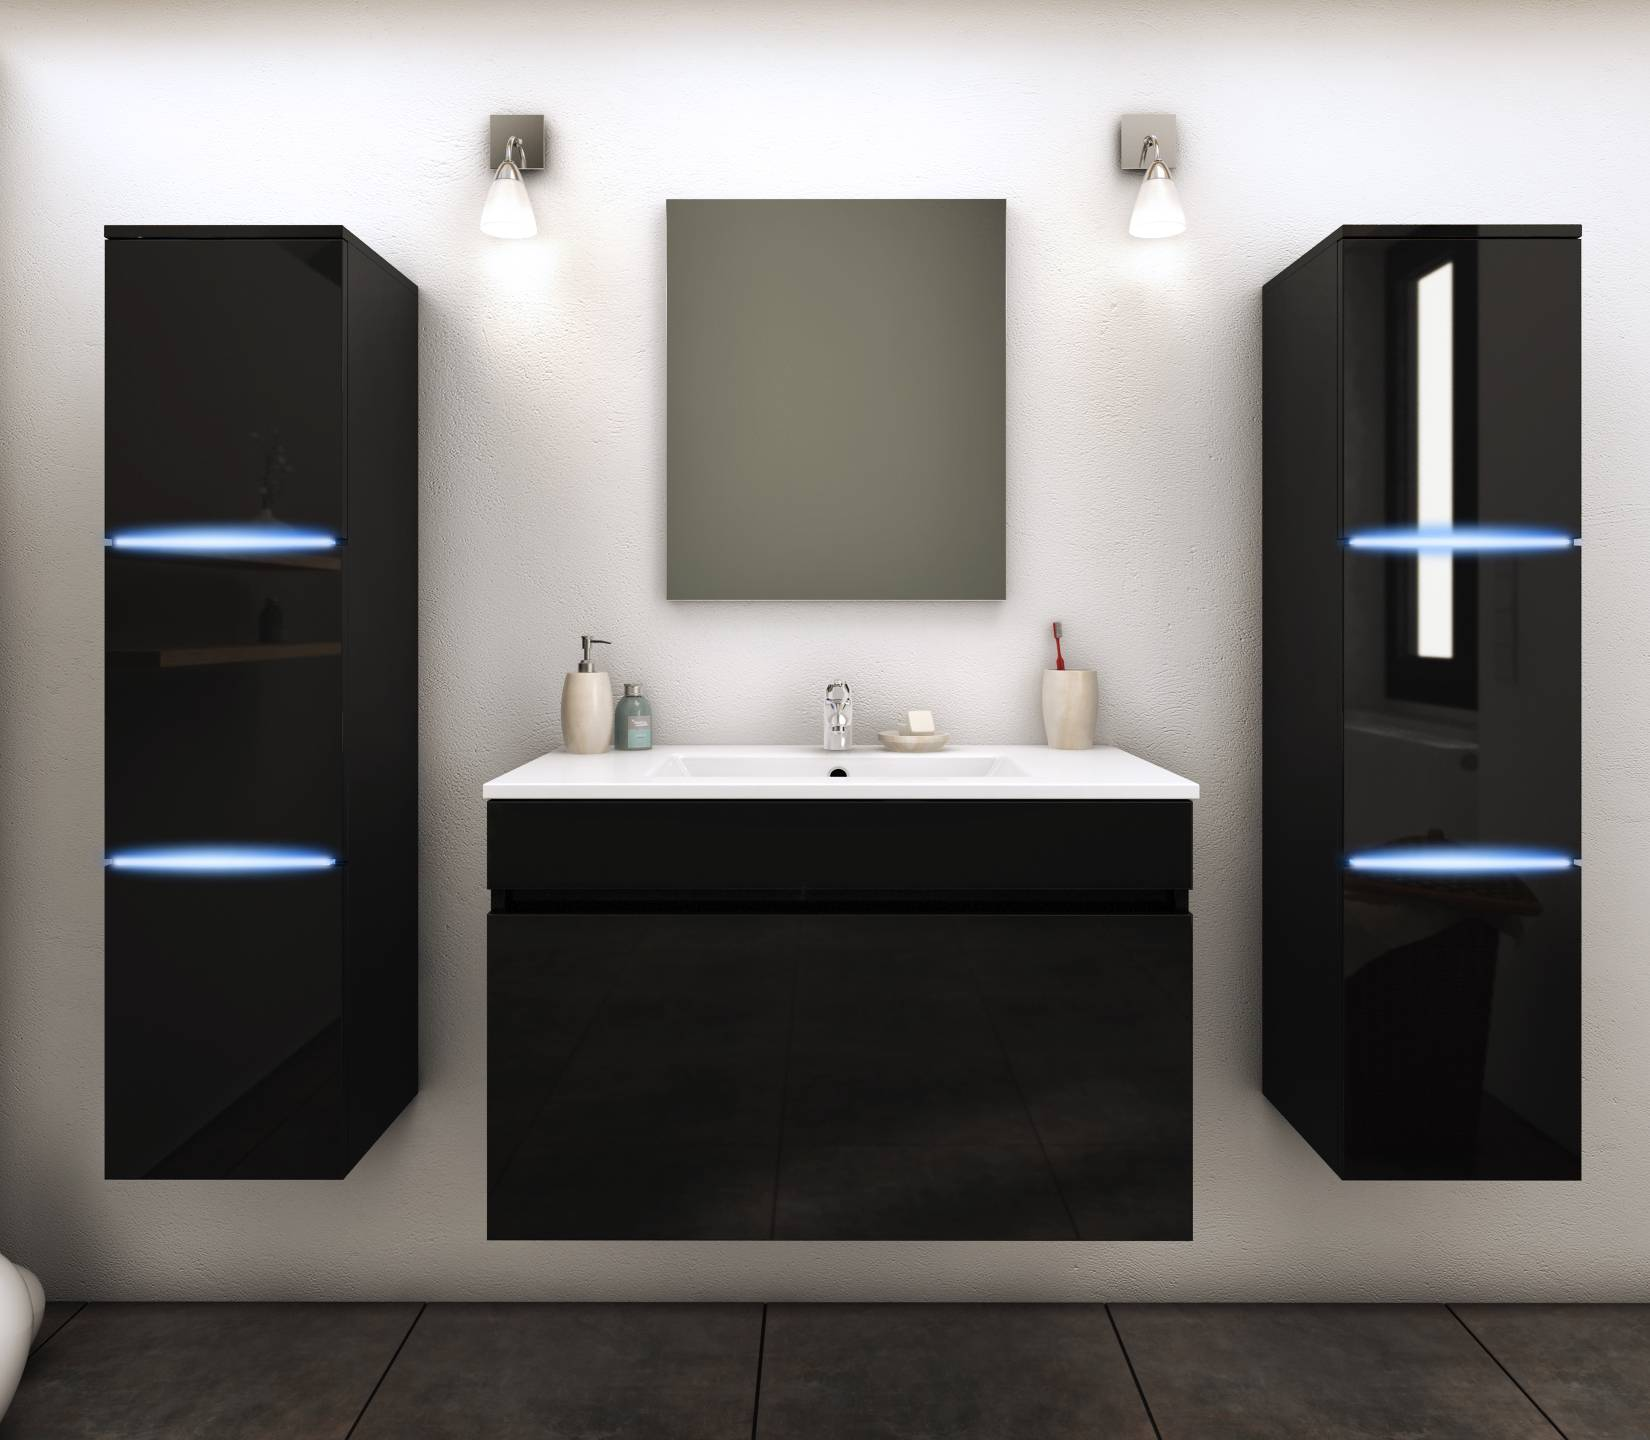 Ensemble de salle de bain mural noir 1 meuble avec vasque + 2 colonnes